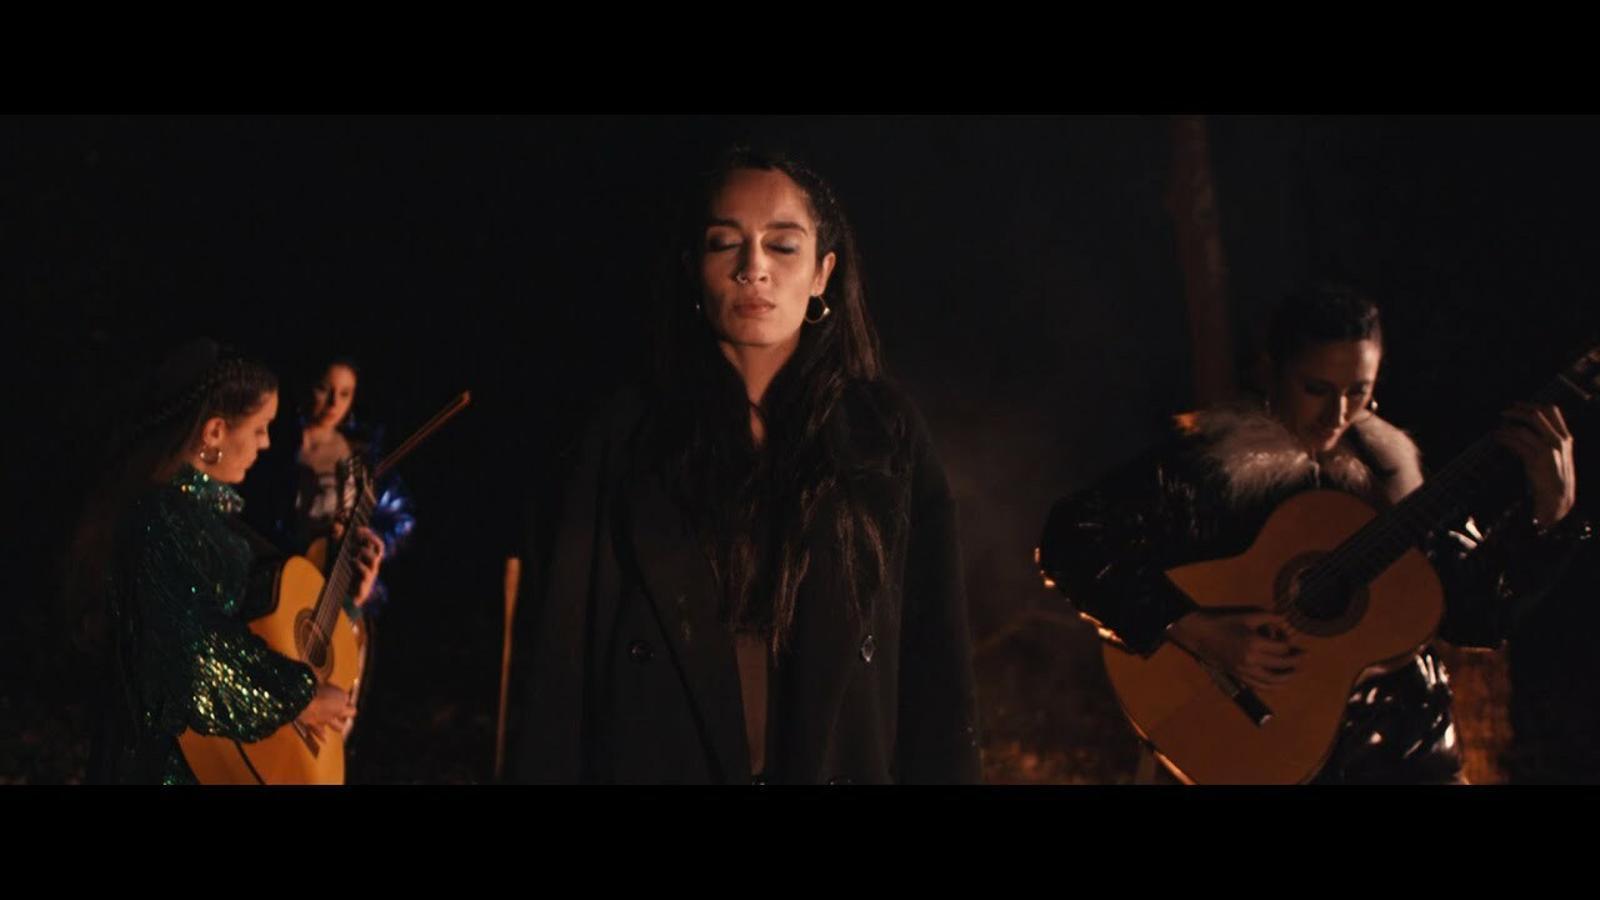 Las Migas, 'La tararara' (2019)